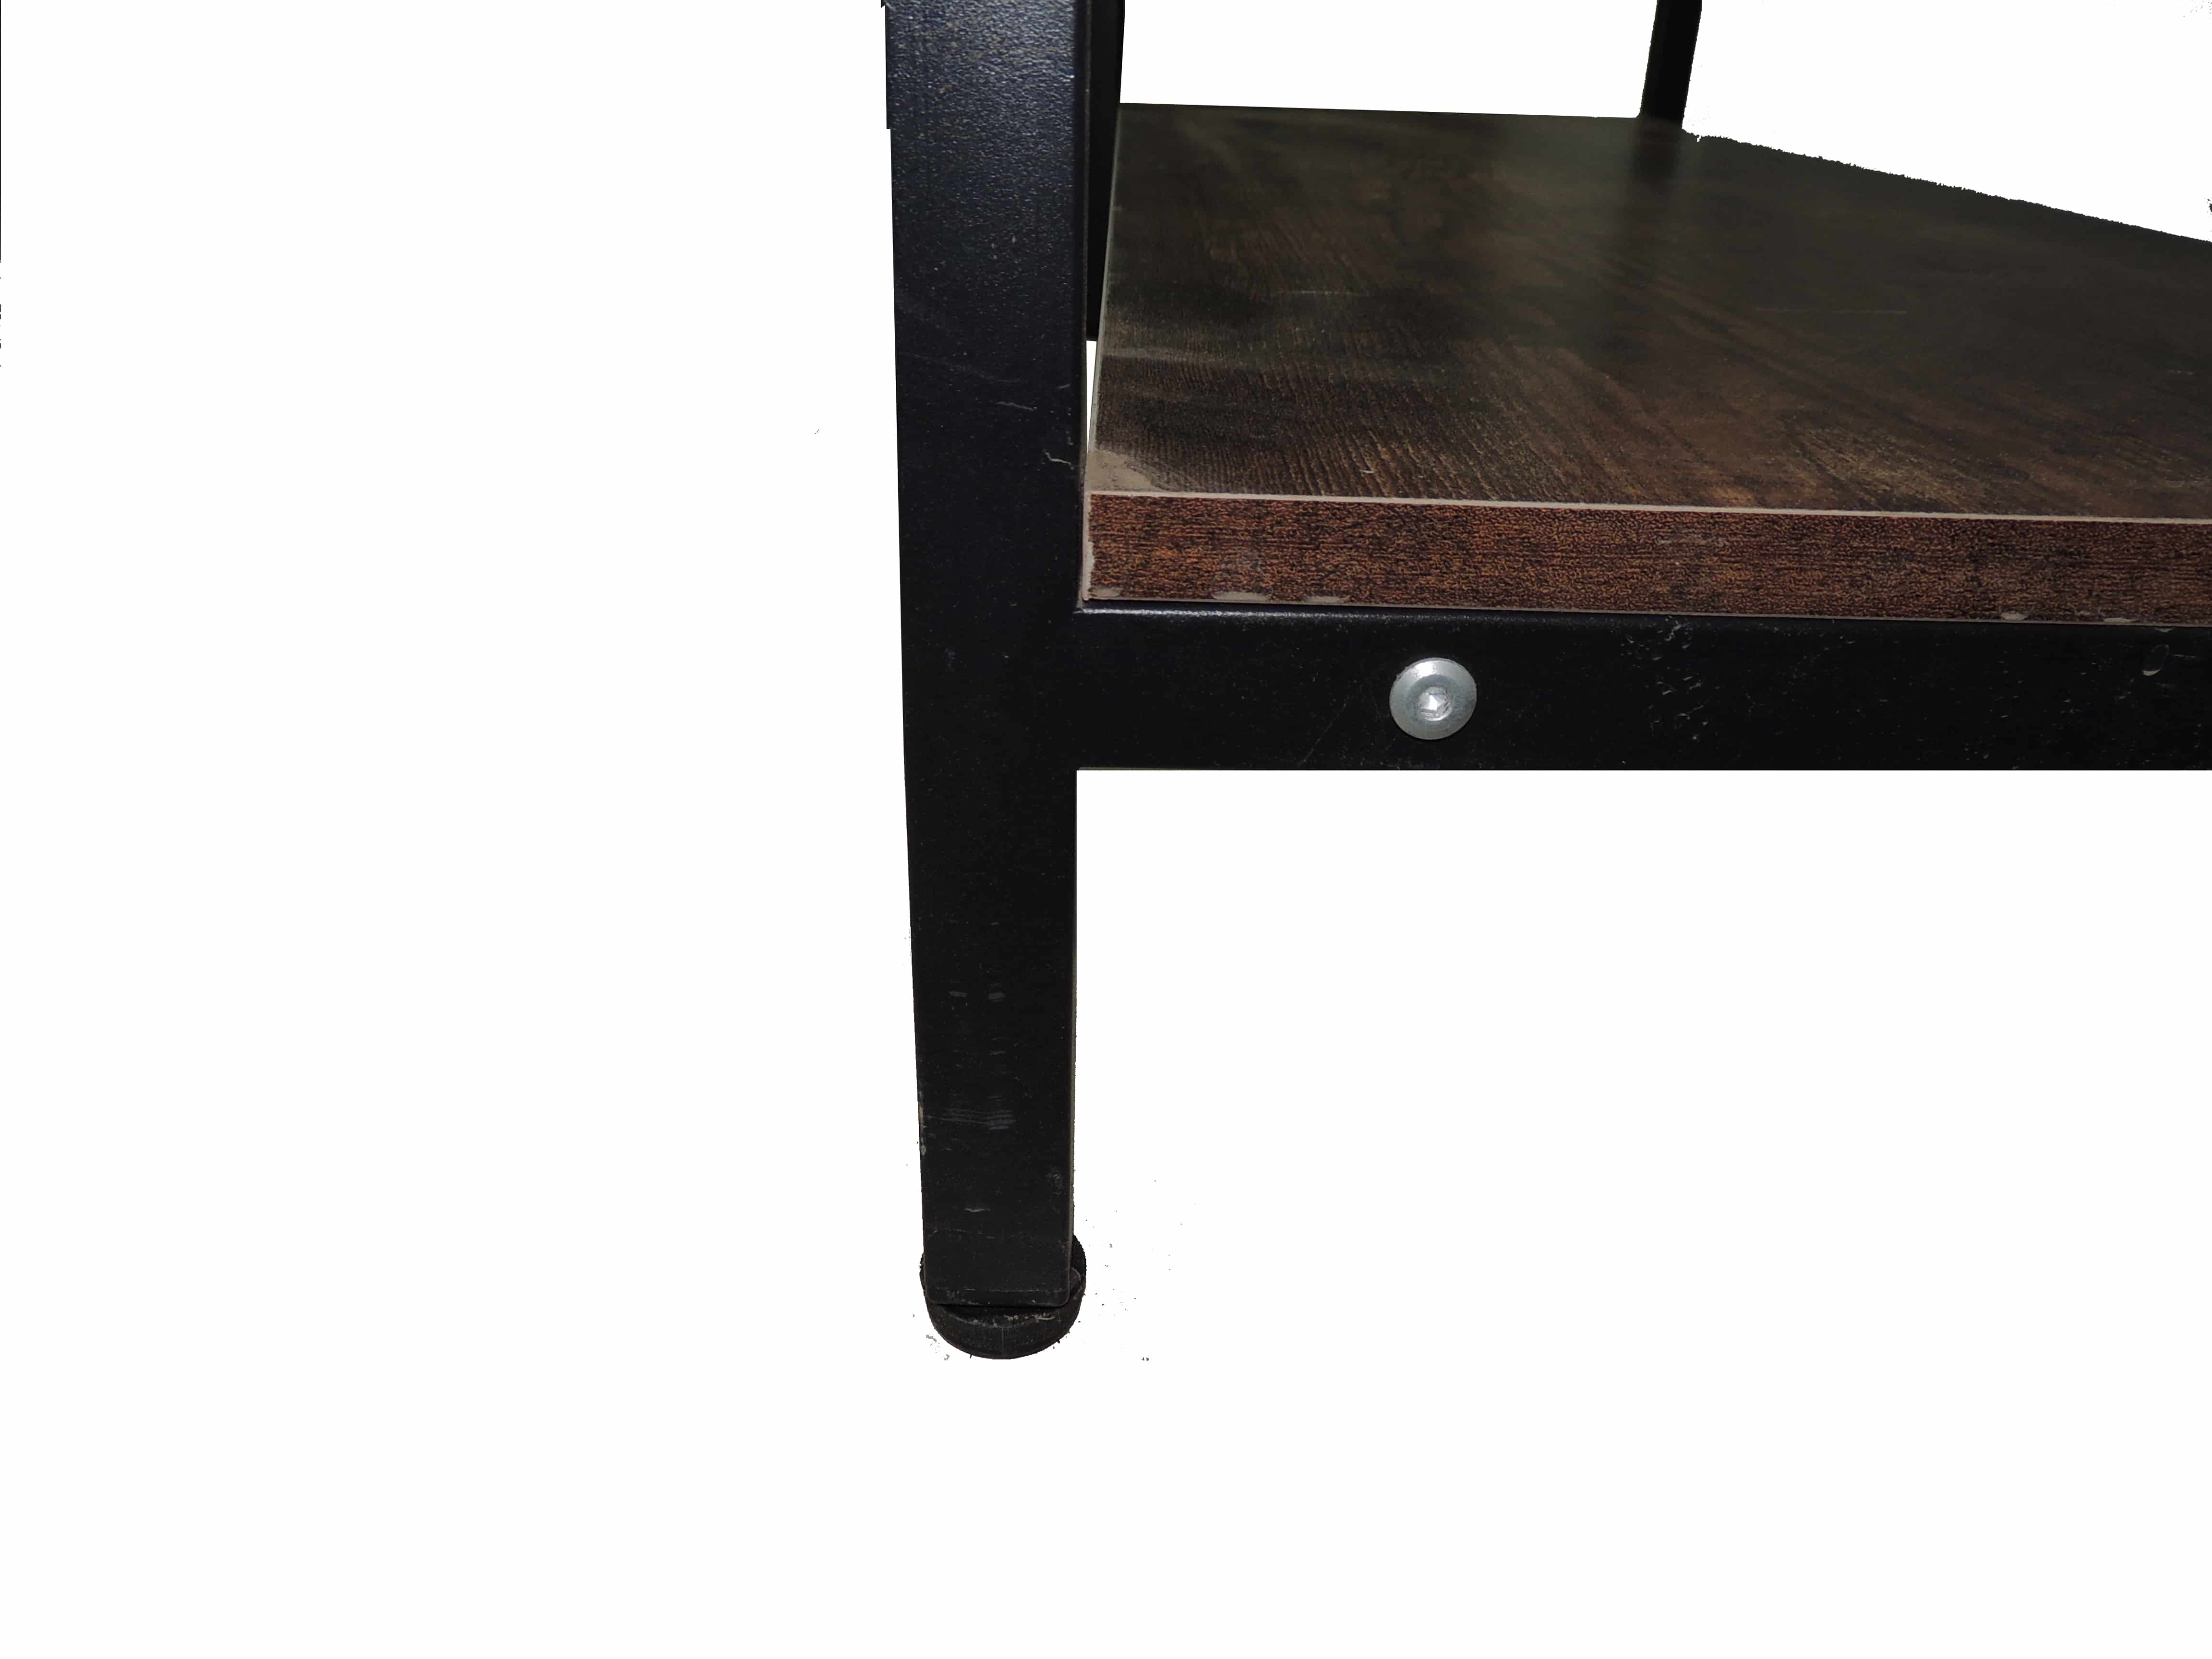 4livingz Retro Stevige Industriële Kapstok 42x100x183 cm - zwart/bruin